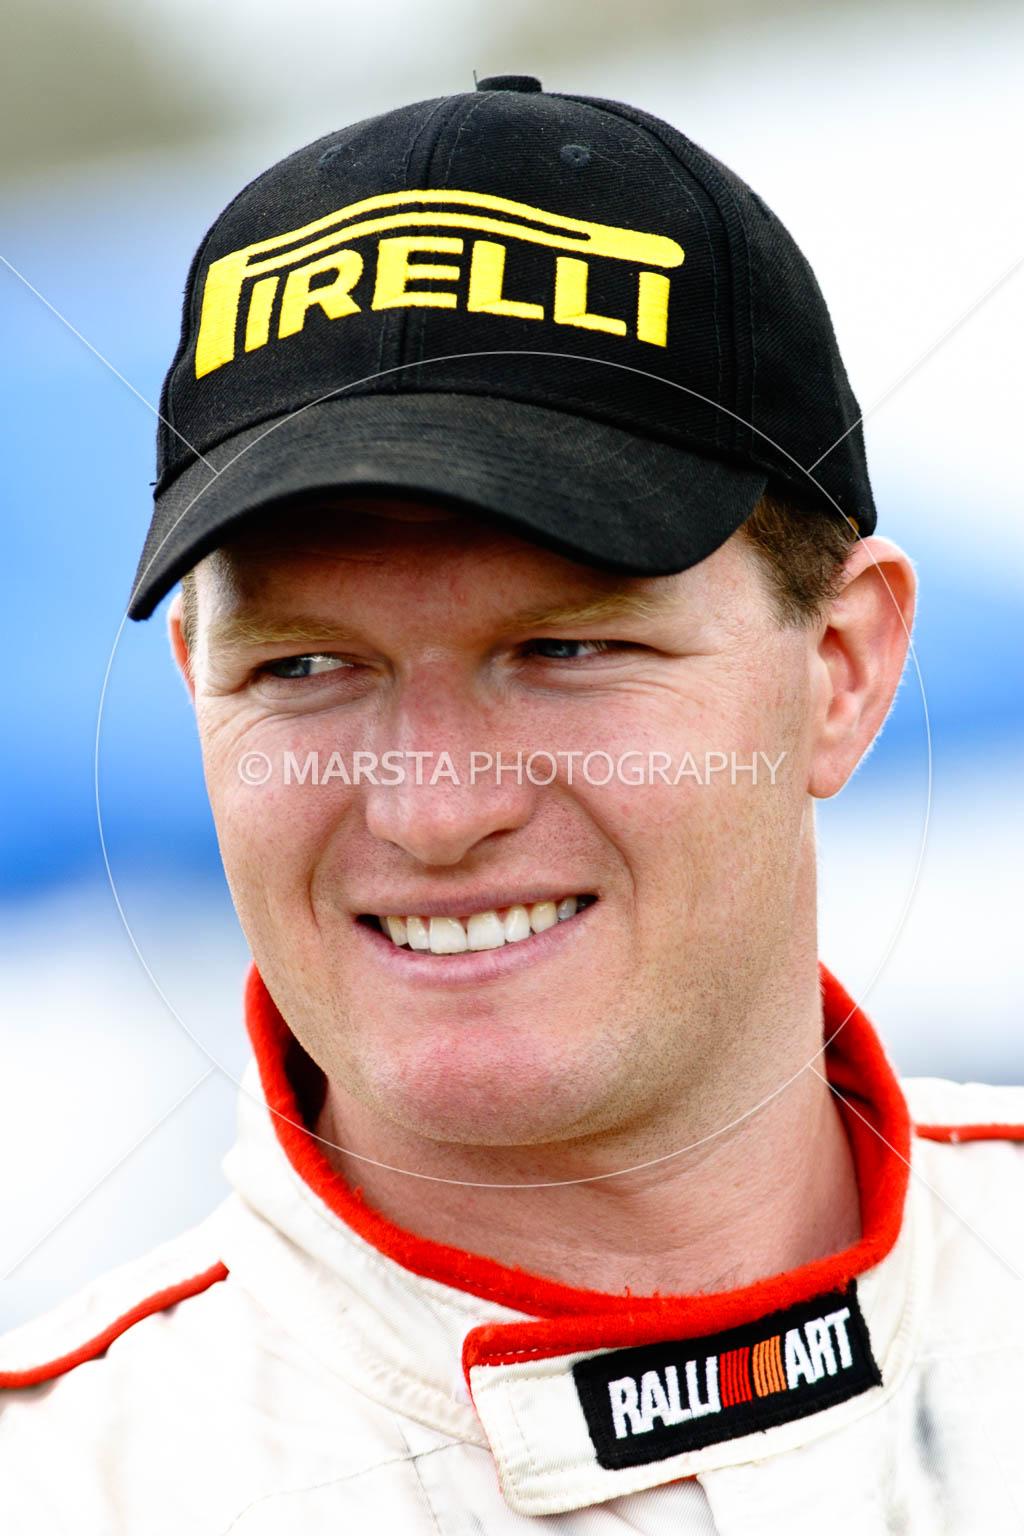 5 June 2005;ARC;Australia;Australian Rally Championship;Coates Rally Queensland;Imbil;Pirelli;QLD;Queensland;RalliArt;Scott Pedder;Sunshine Coast;Topshot;auto;cap;hat;logo;motorsport;portrait;racing;smile